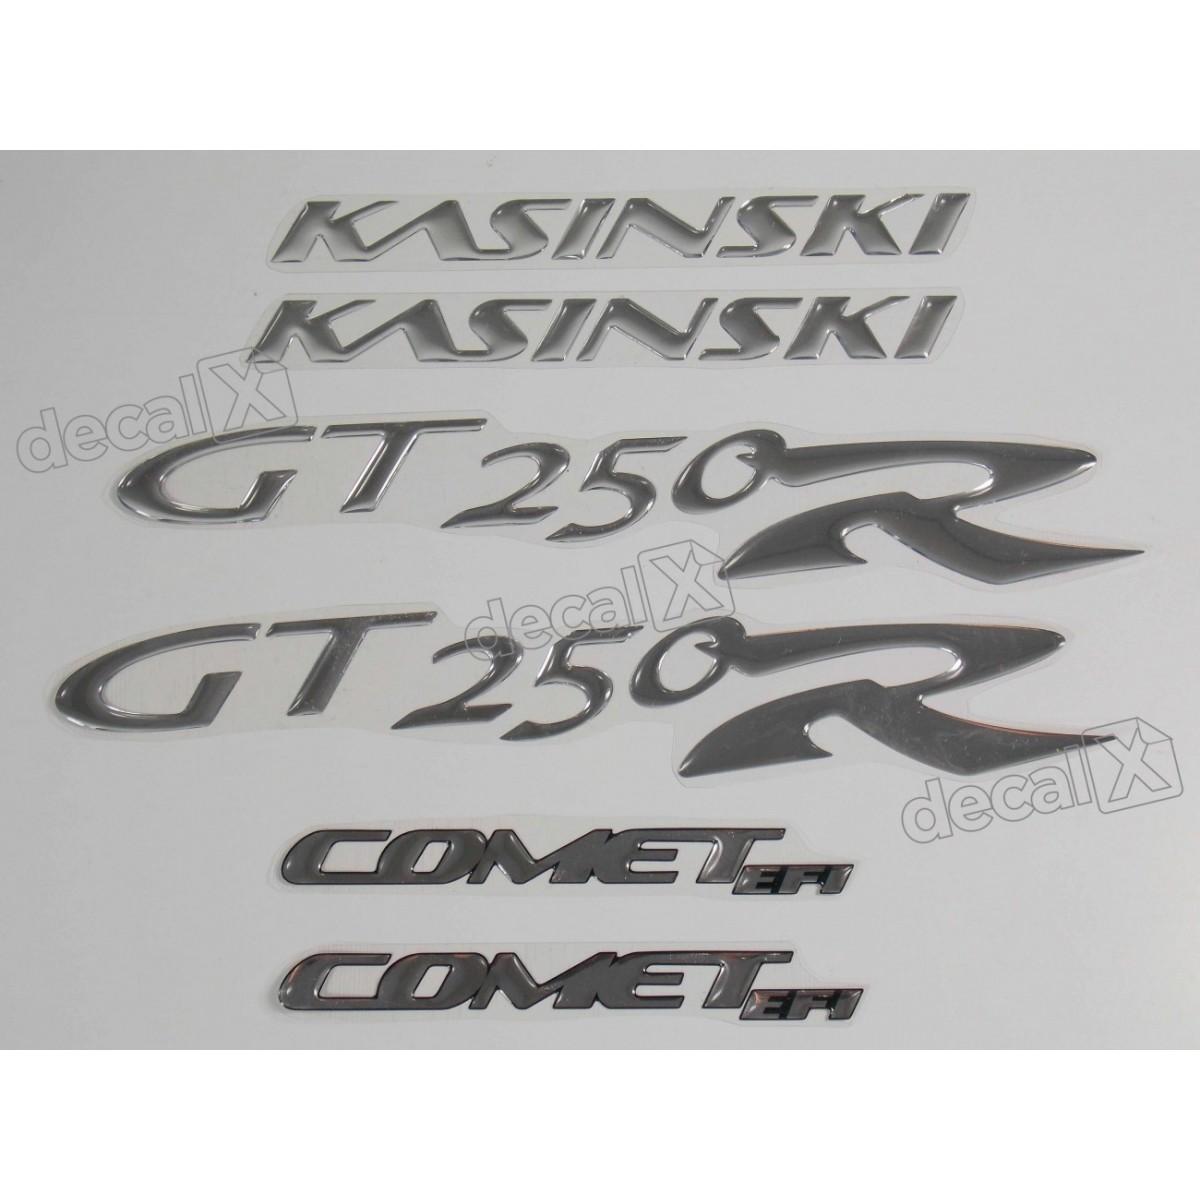 Kit Adesivos Resinados Kasinski Comet Gt 250r Rs1